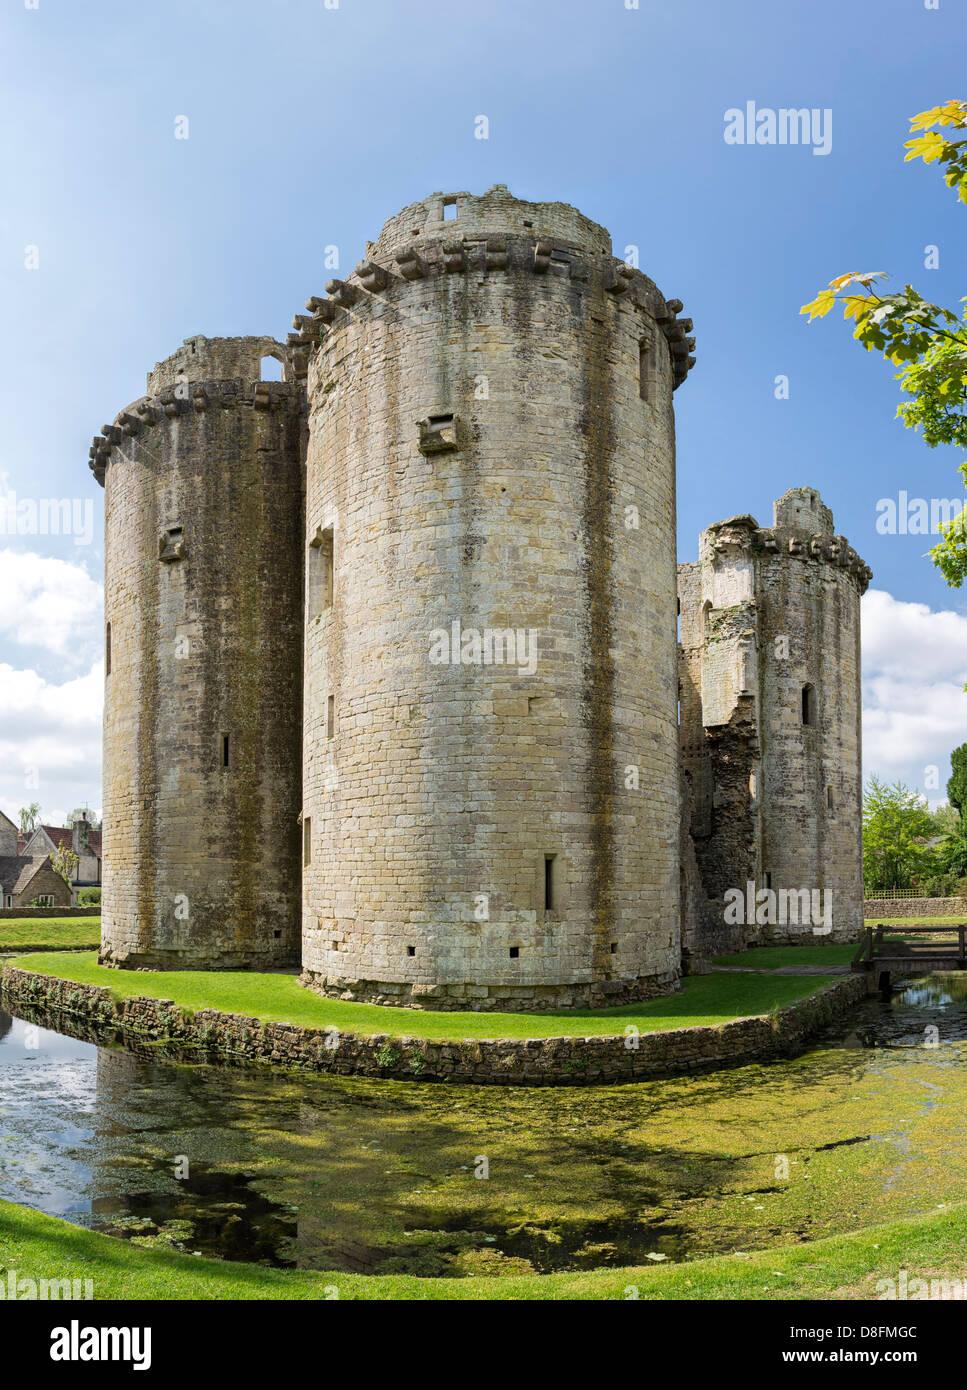 Ruined medieval Nunney castle, Somerset, England, UK Stock Photo